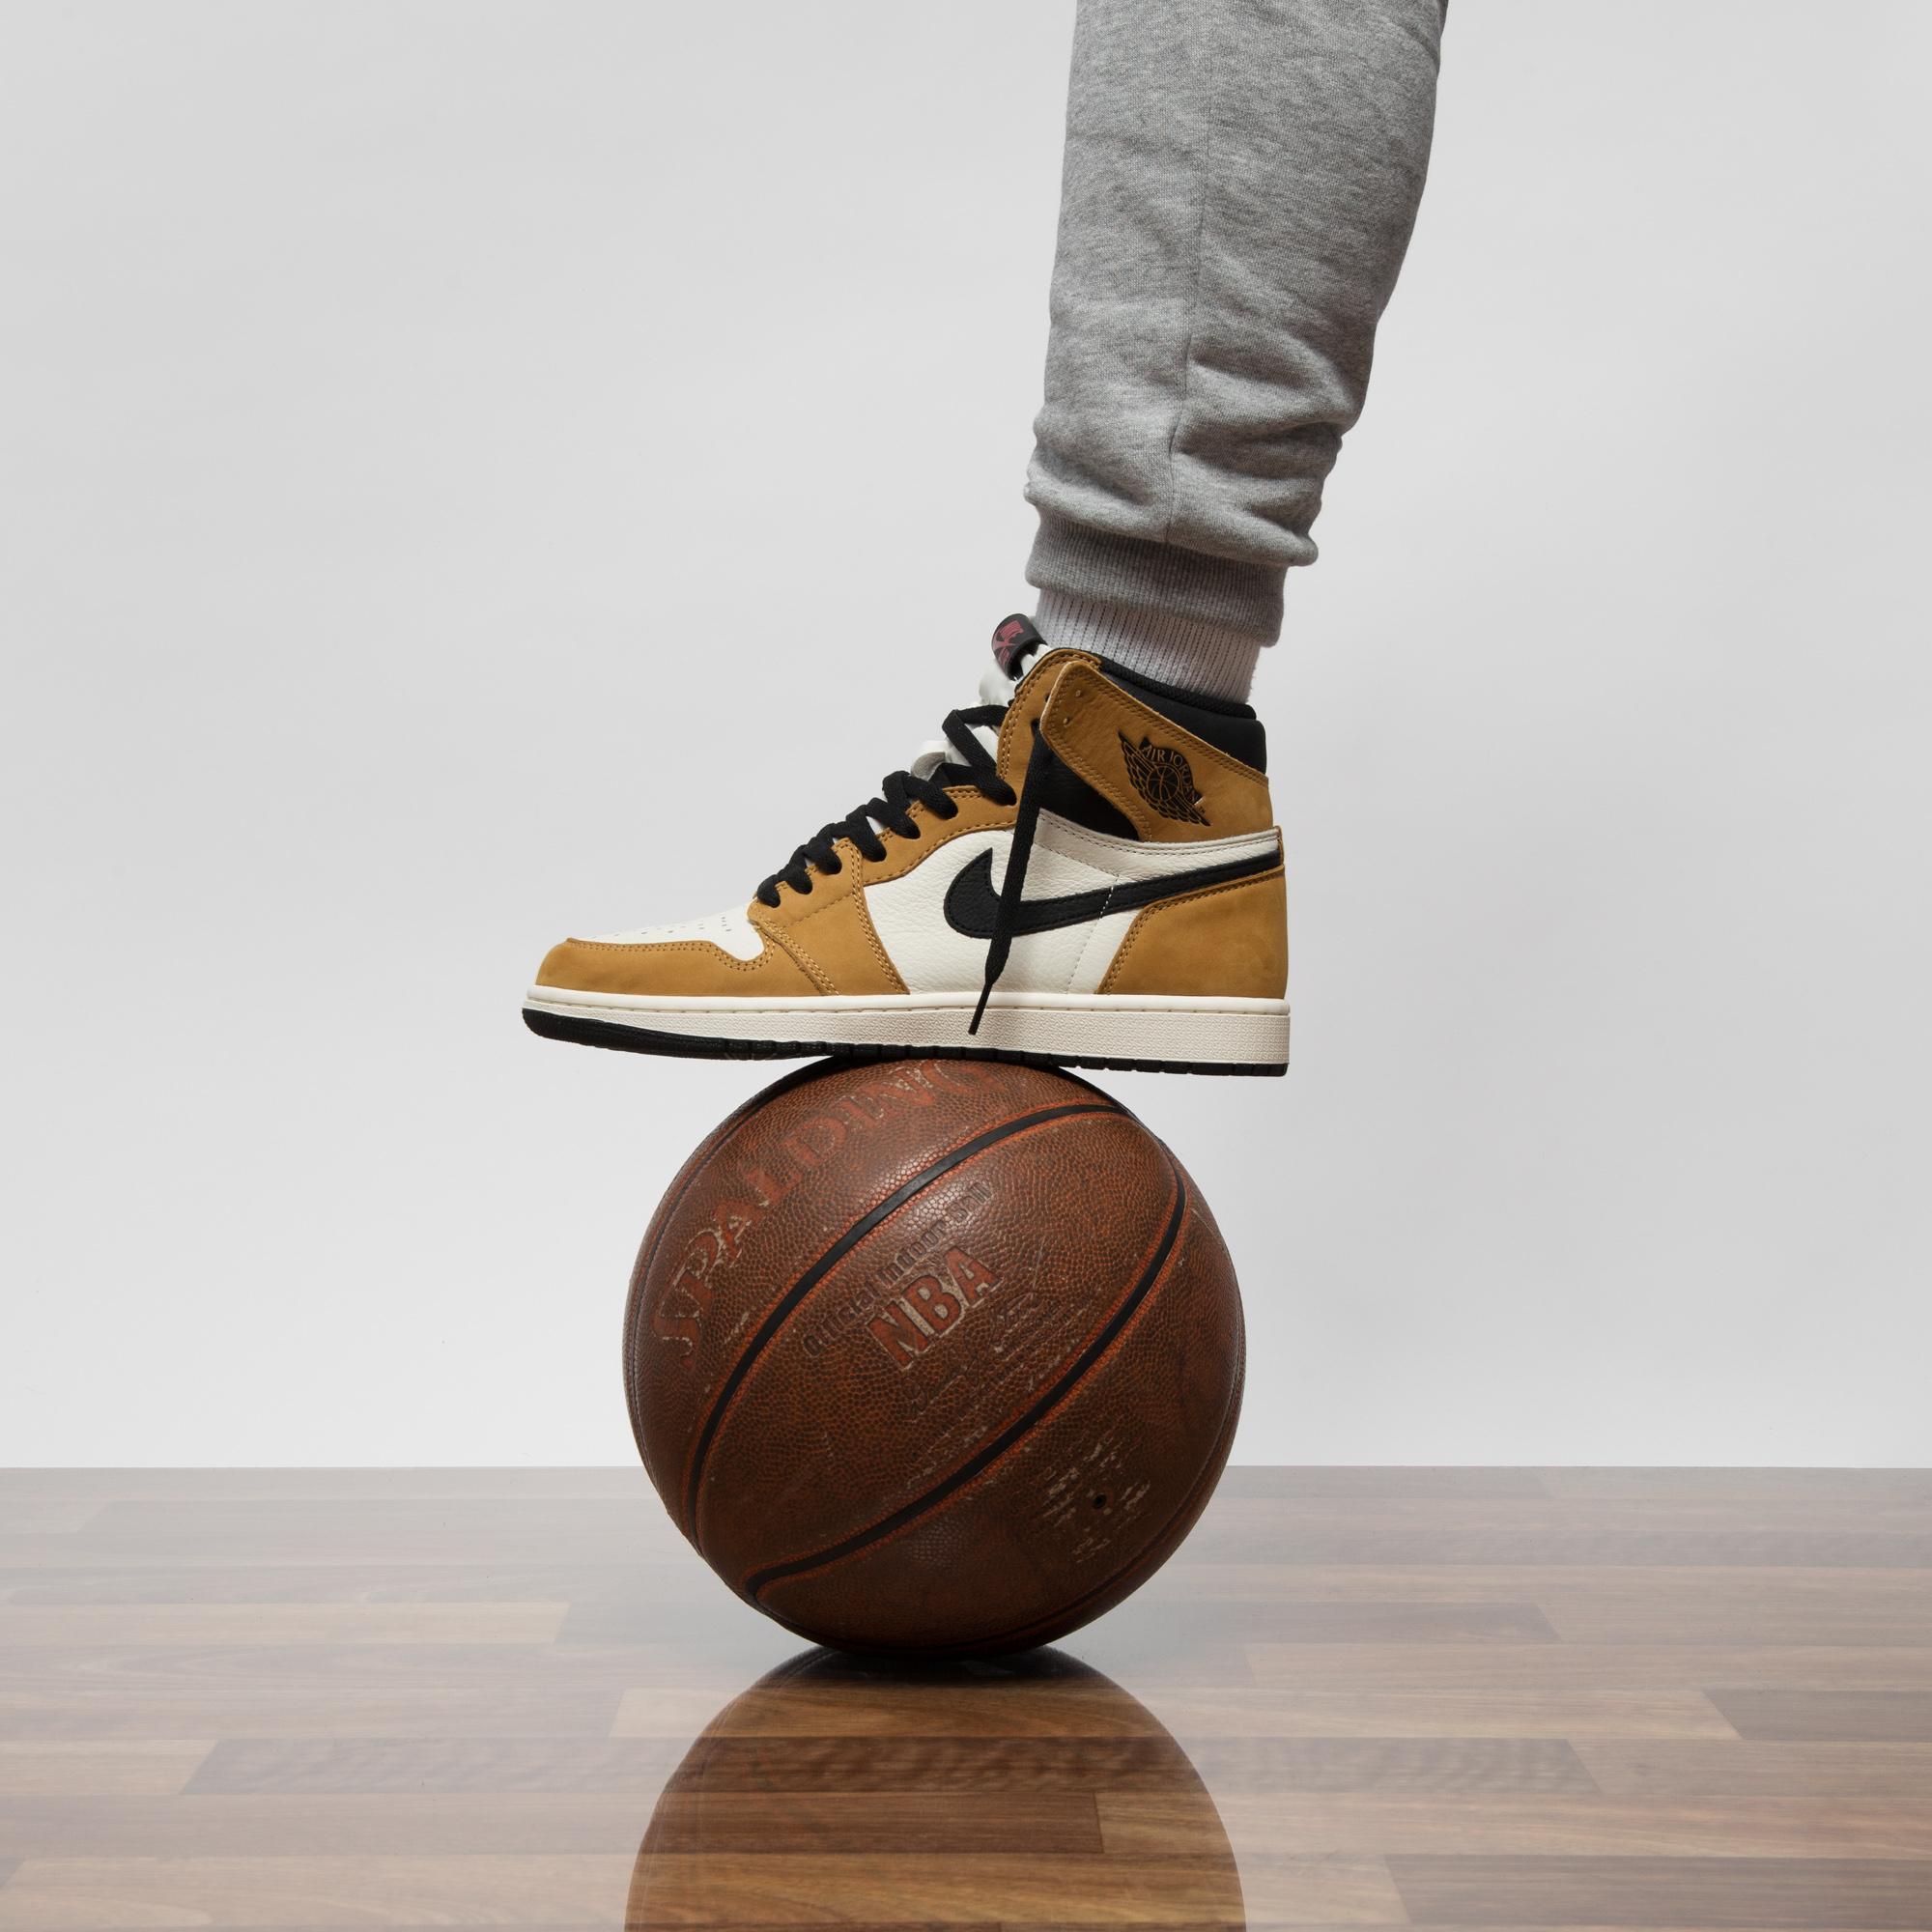 buy good new design brand new Air Jordan 1 Retro High OG Rookie Of The Year • KicksOnFire.com